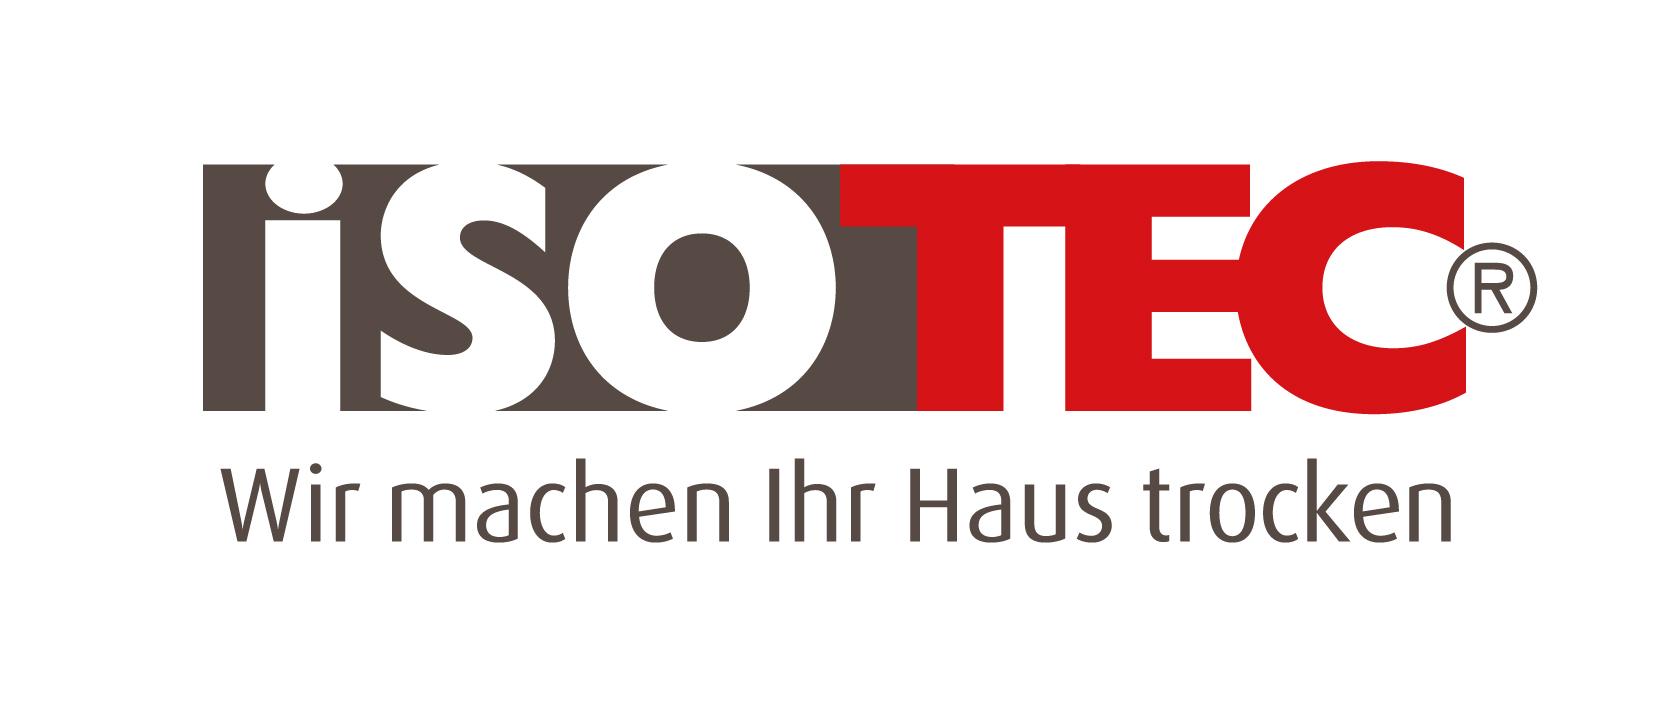 ISOTEC-Fachbetrieb Abdichtungstechnik Joachim Hug